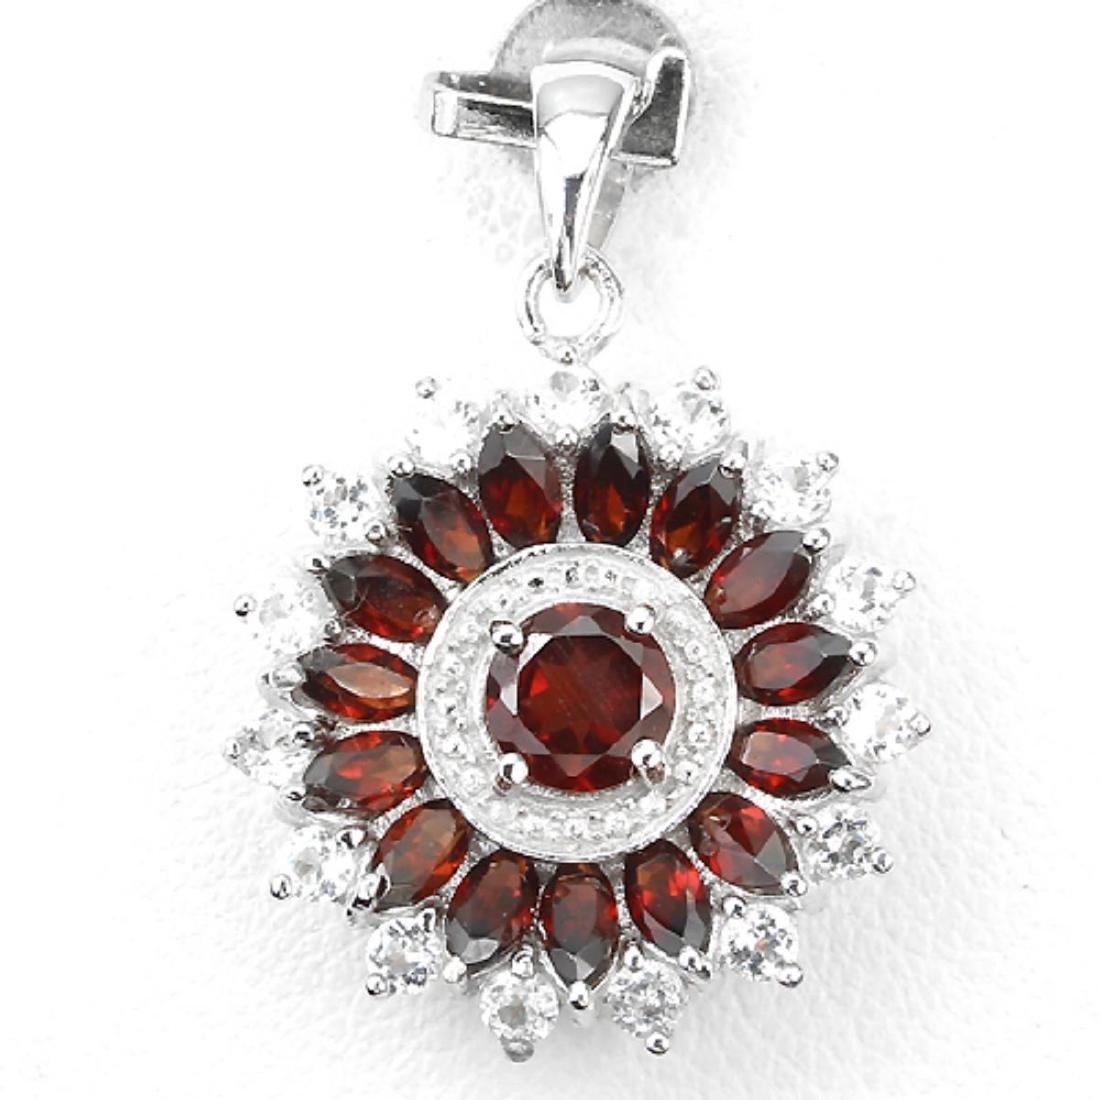 Natural Gemstone Pendant